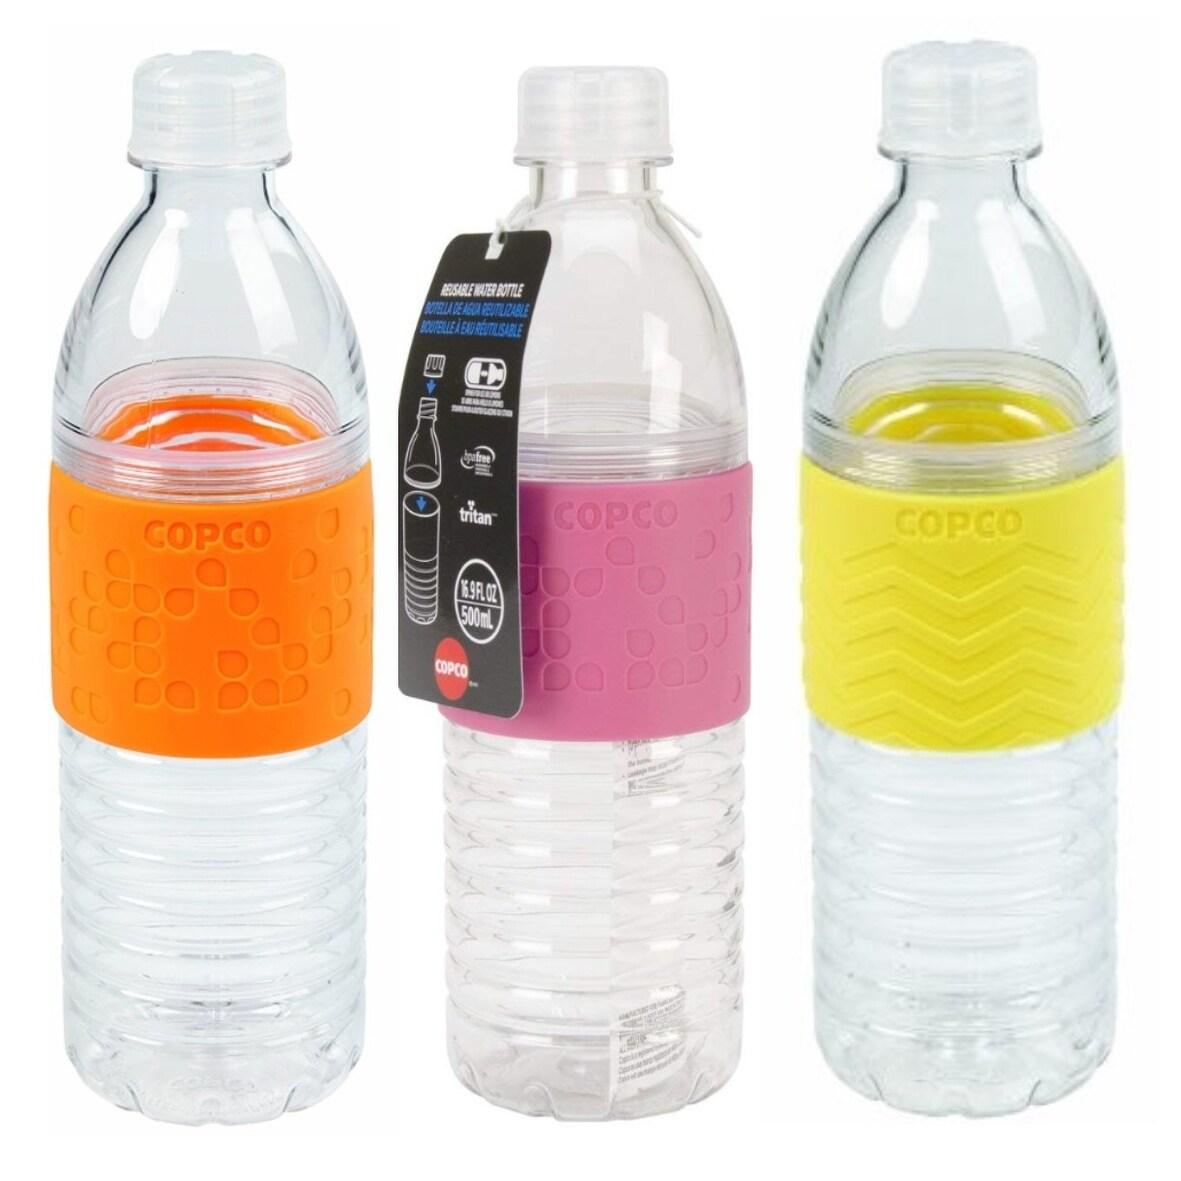 Copco Hydra Water Bottle Non Slip Sleeve BPA Free Reusable 16.9 Oz Light Blue